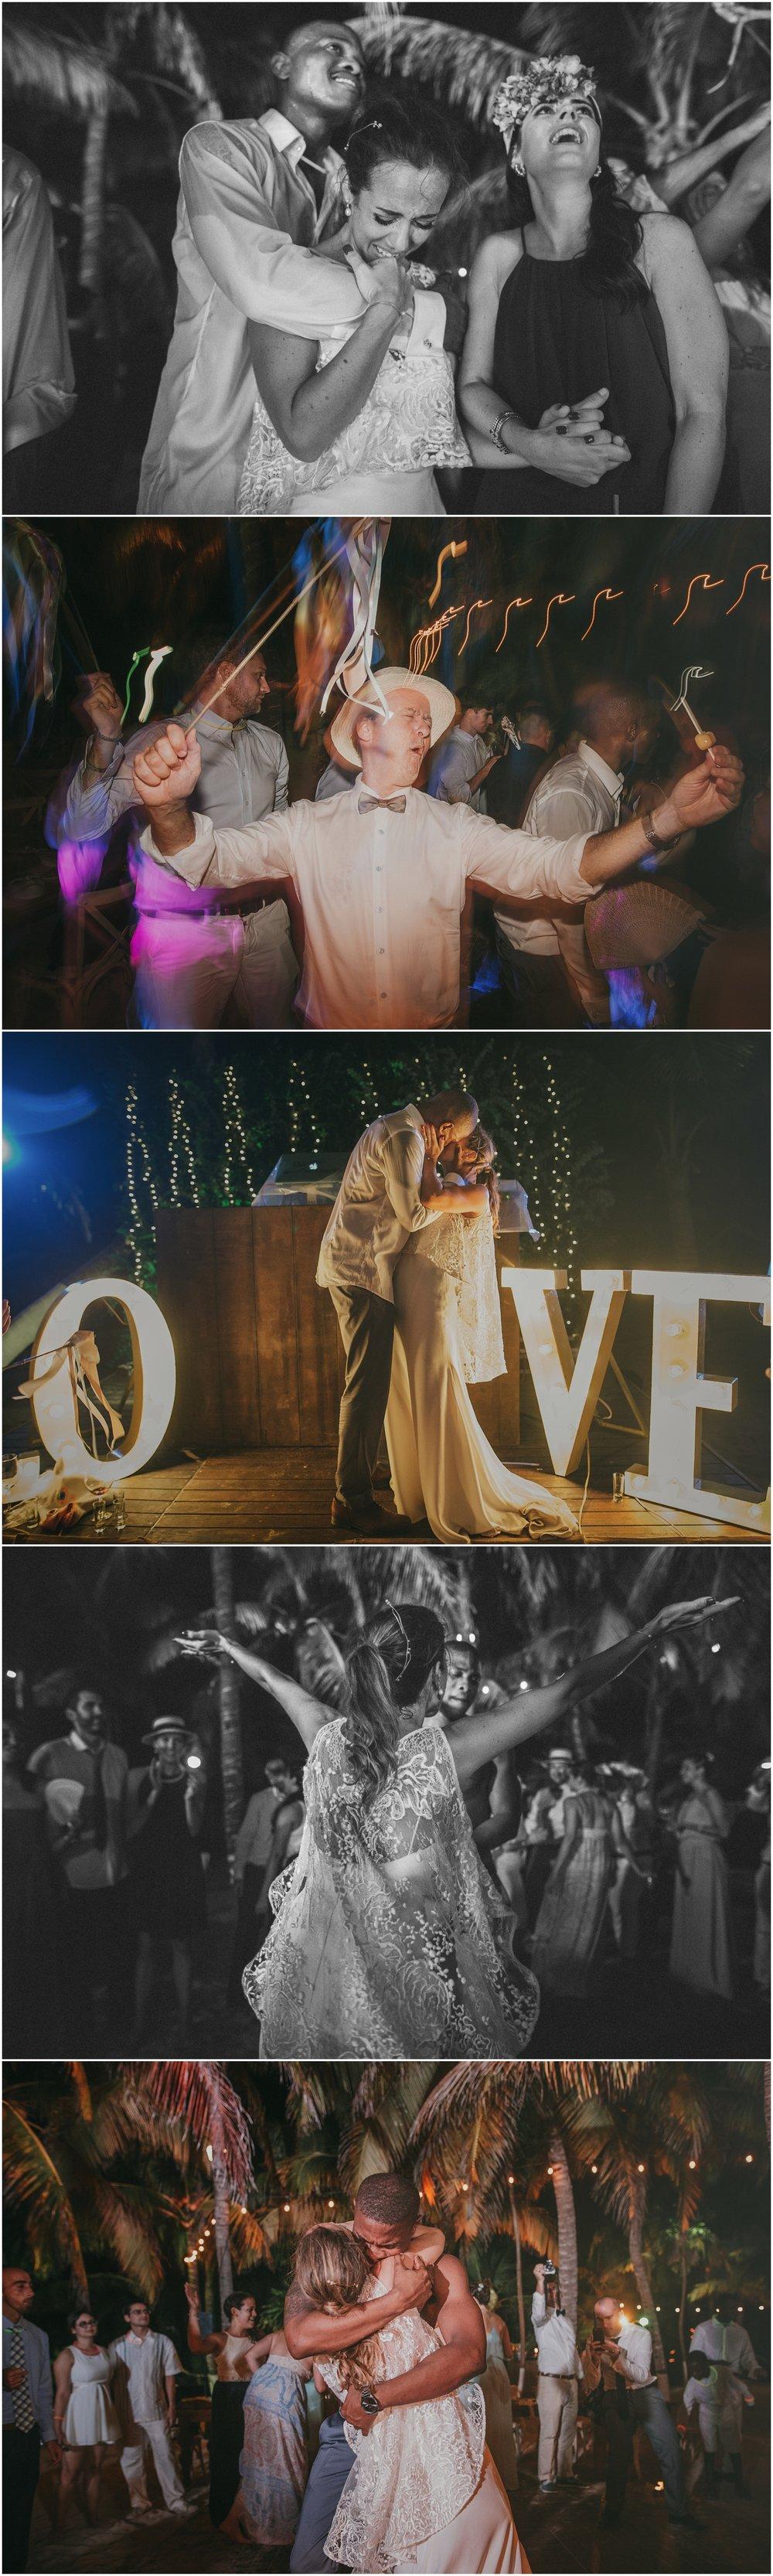 Pablo Laguia wedding photographer 142.jpg